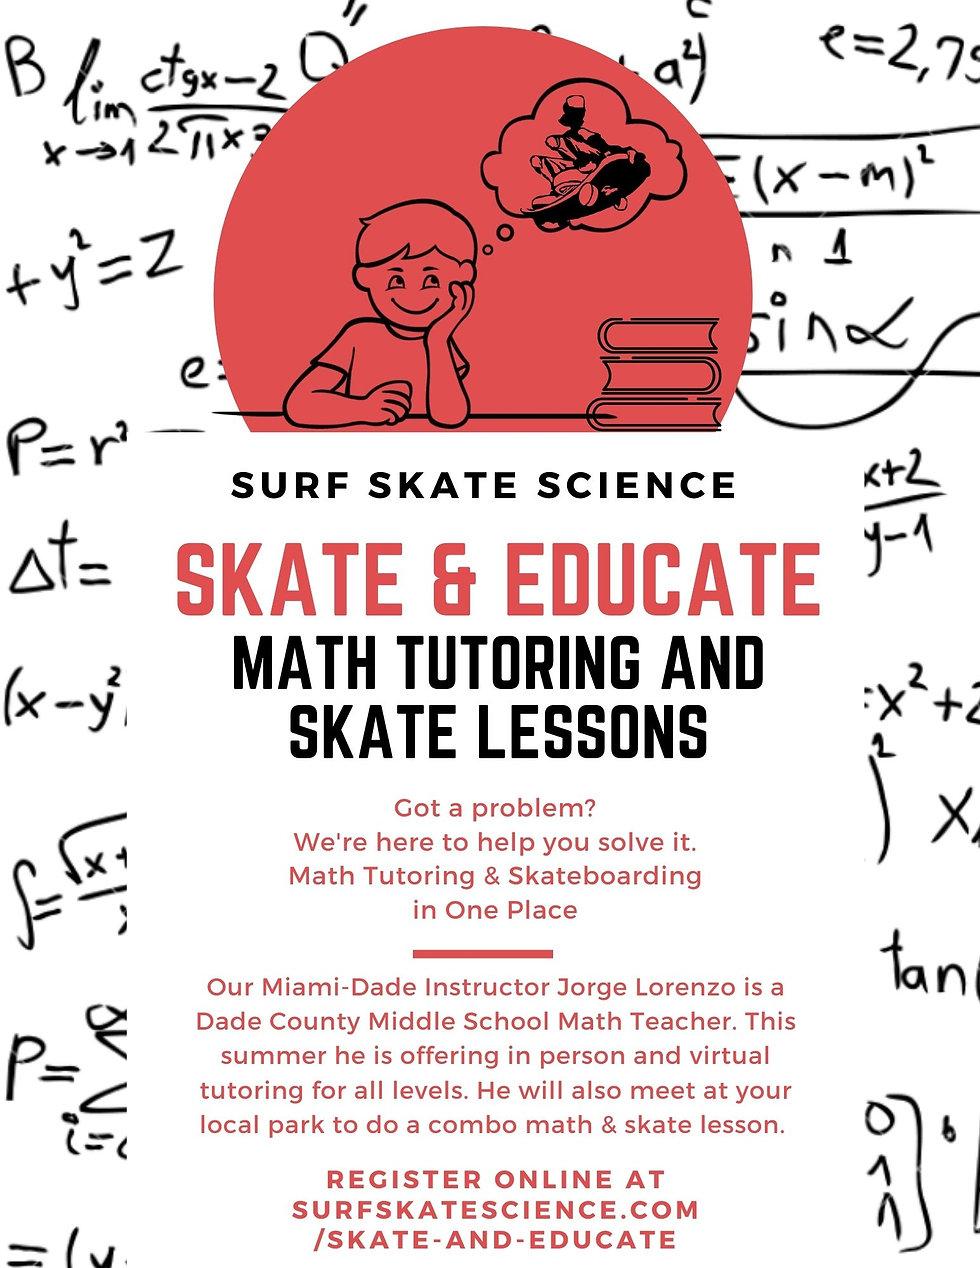 SKATE & EDUCATE Math Tutoring AND SKATE